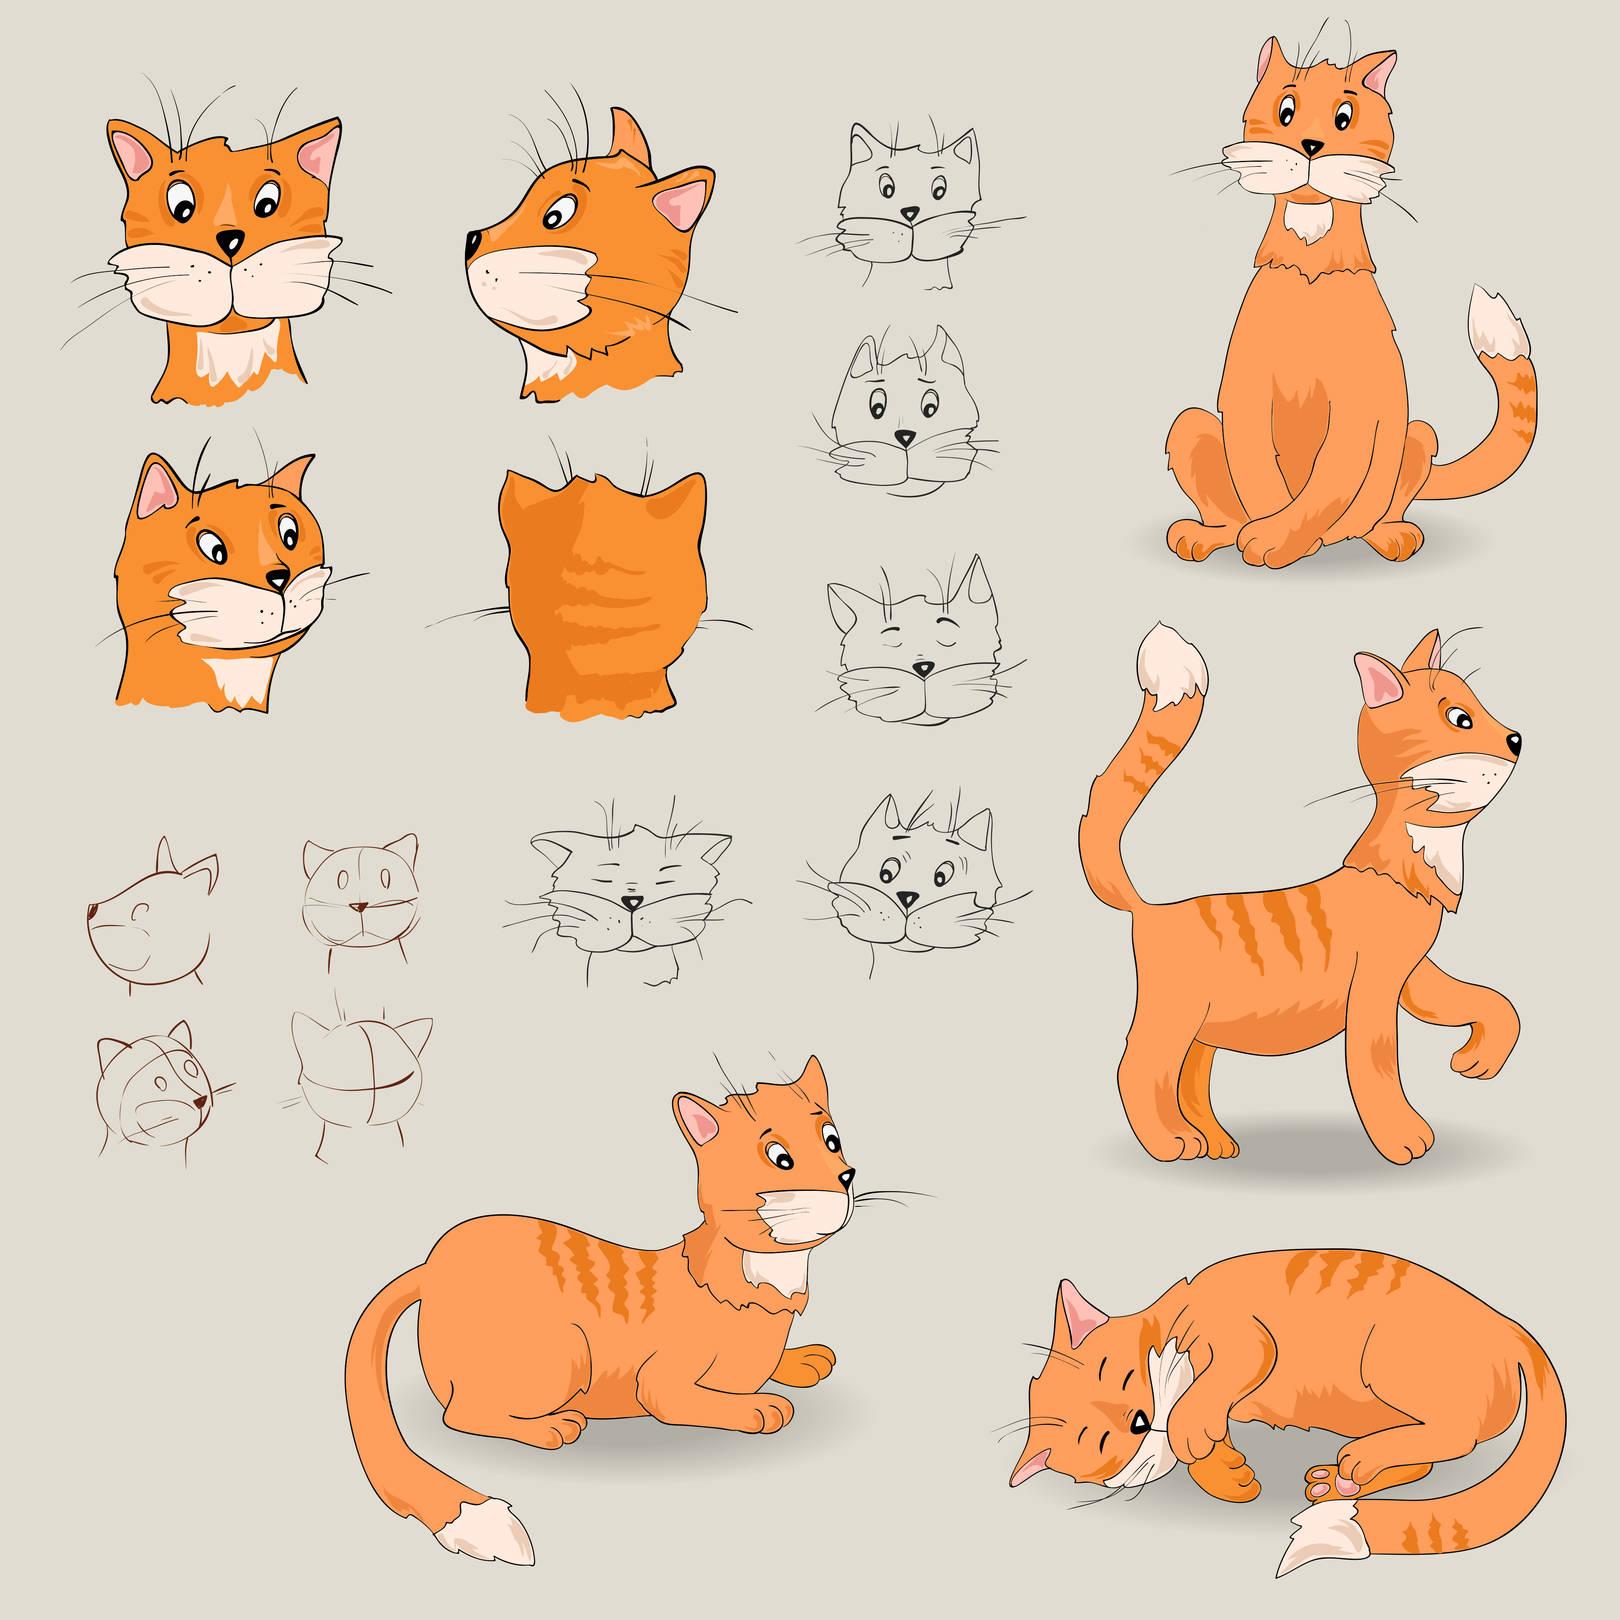 Разработка персонажа - Котик